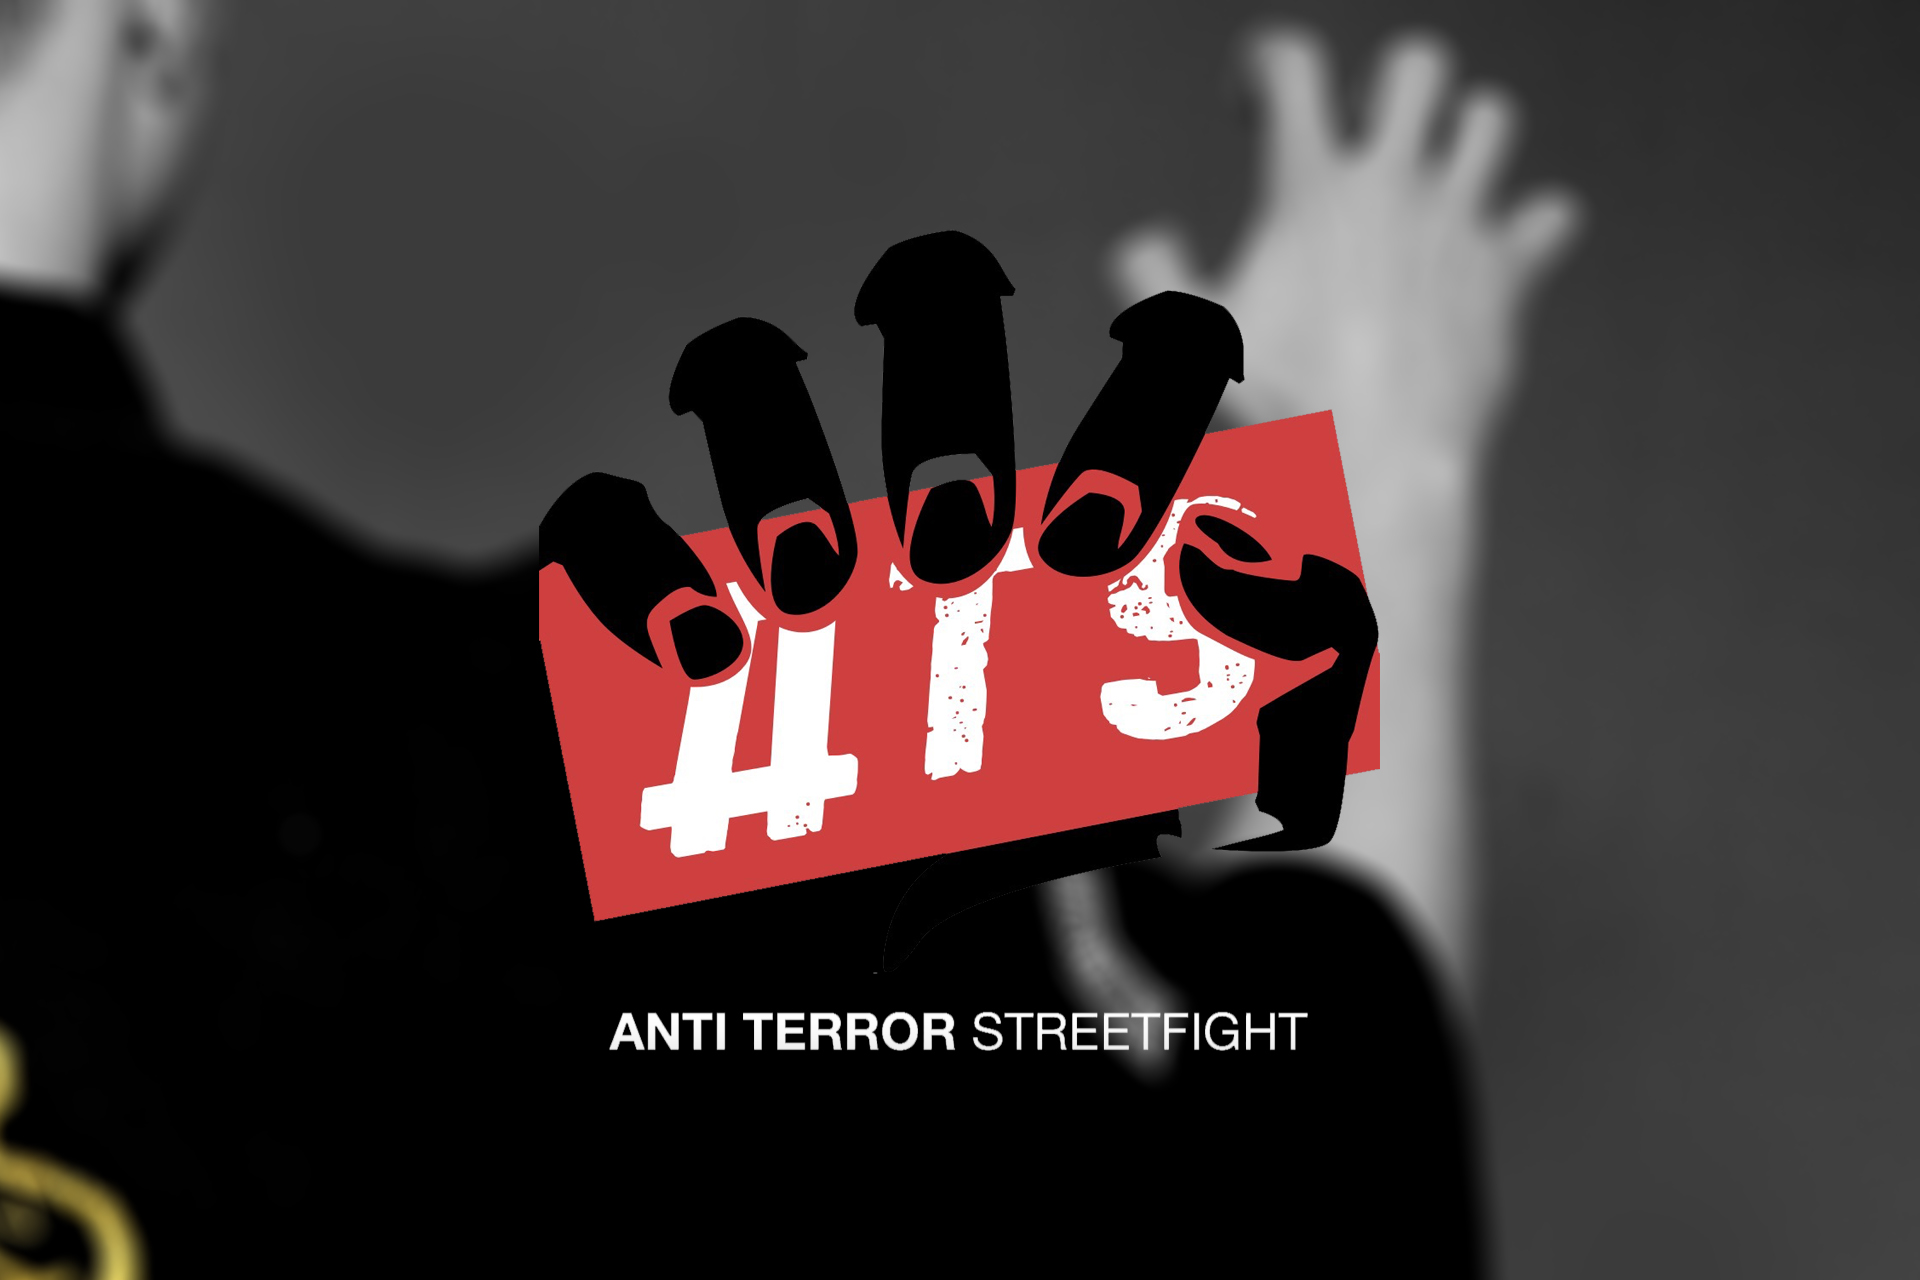 Anti Terror Streetfight